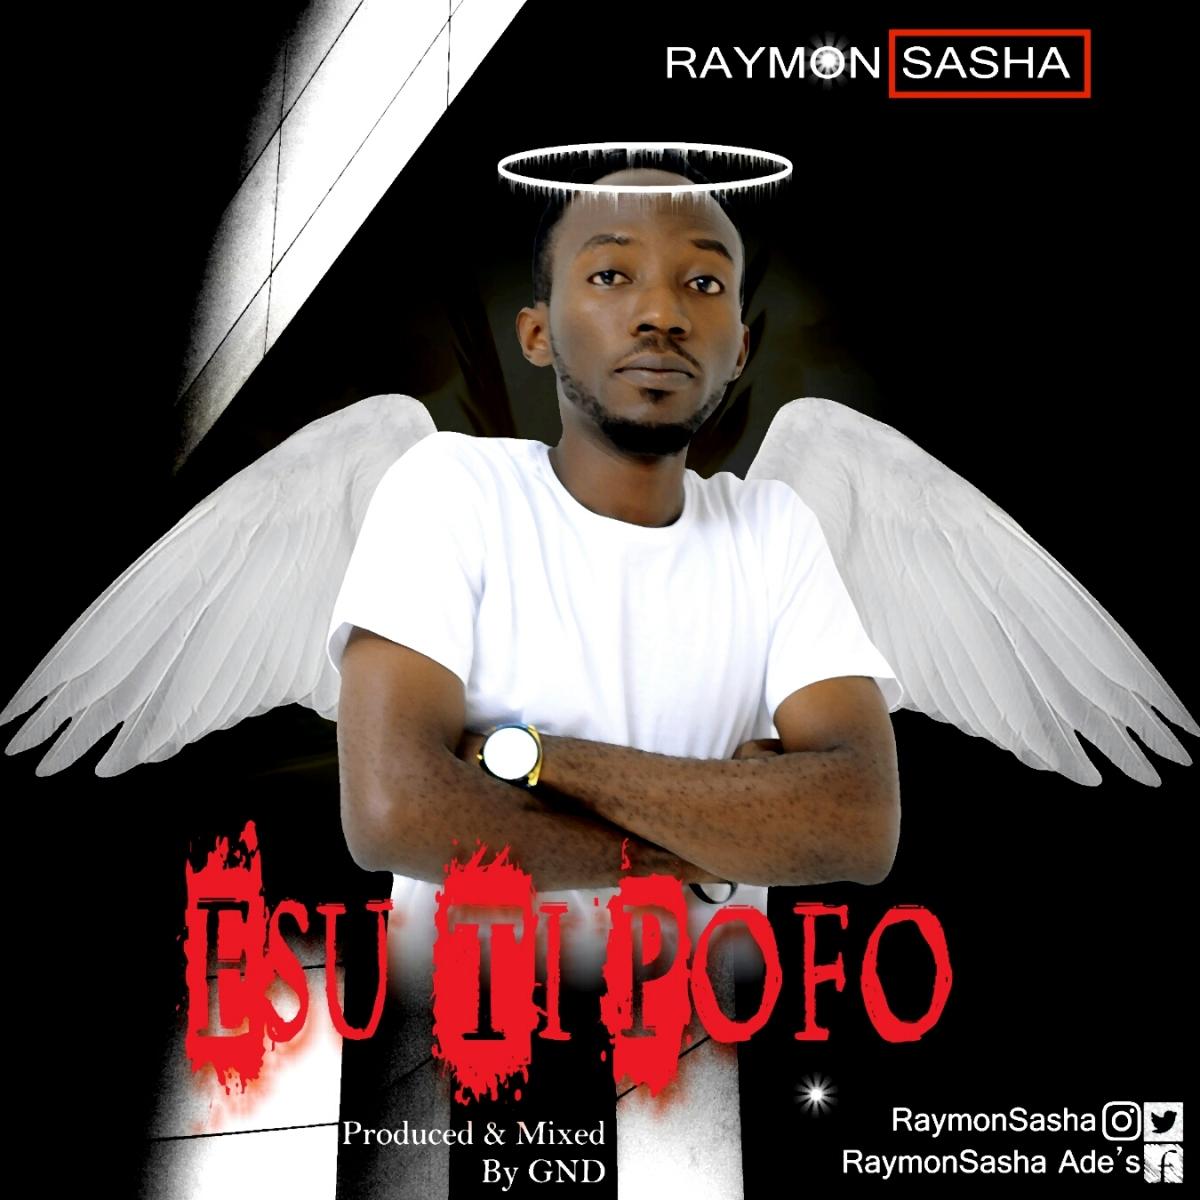 Raymon Sasha - Esu Ti Pofo | http://bit.ly/2mA5Oma | @RaymonSasha | #UberTalksMusic